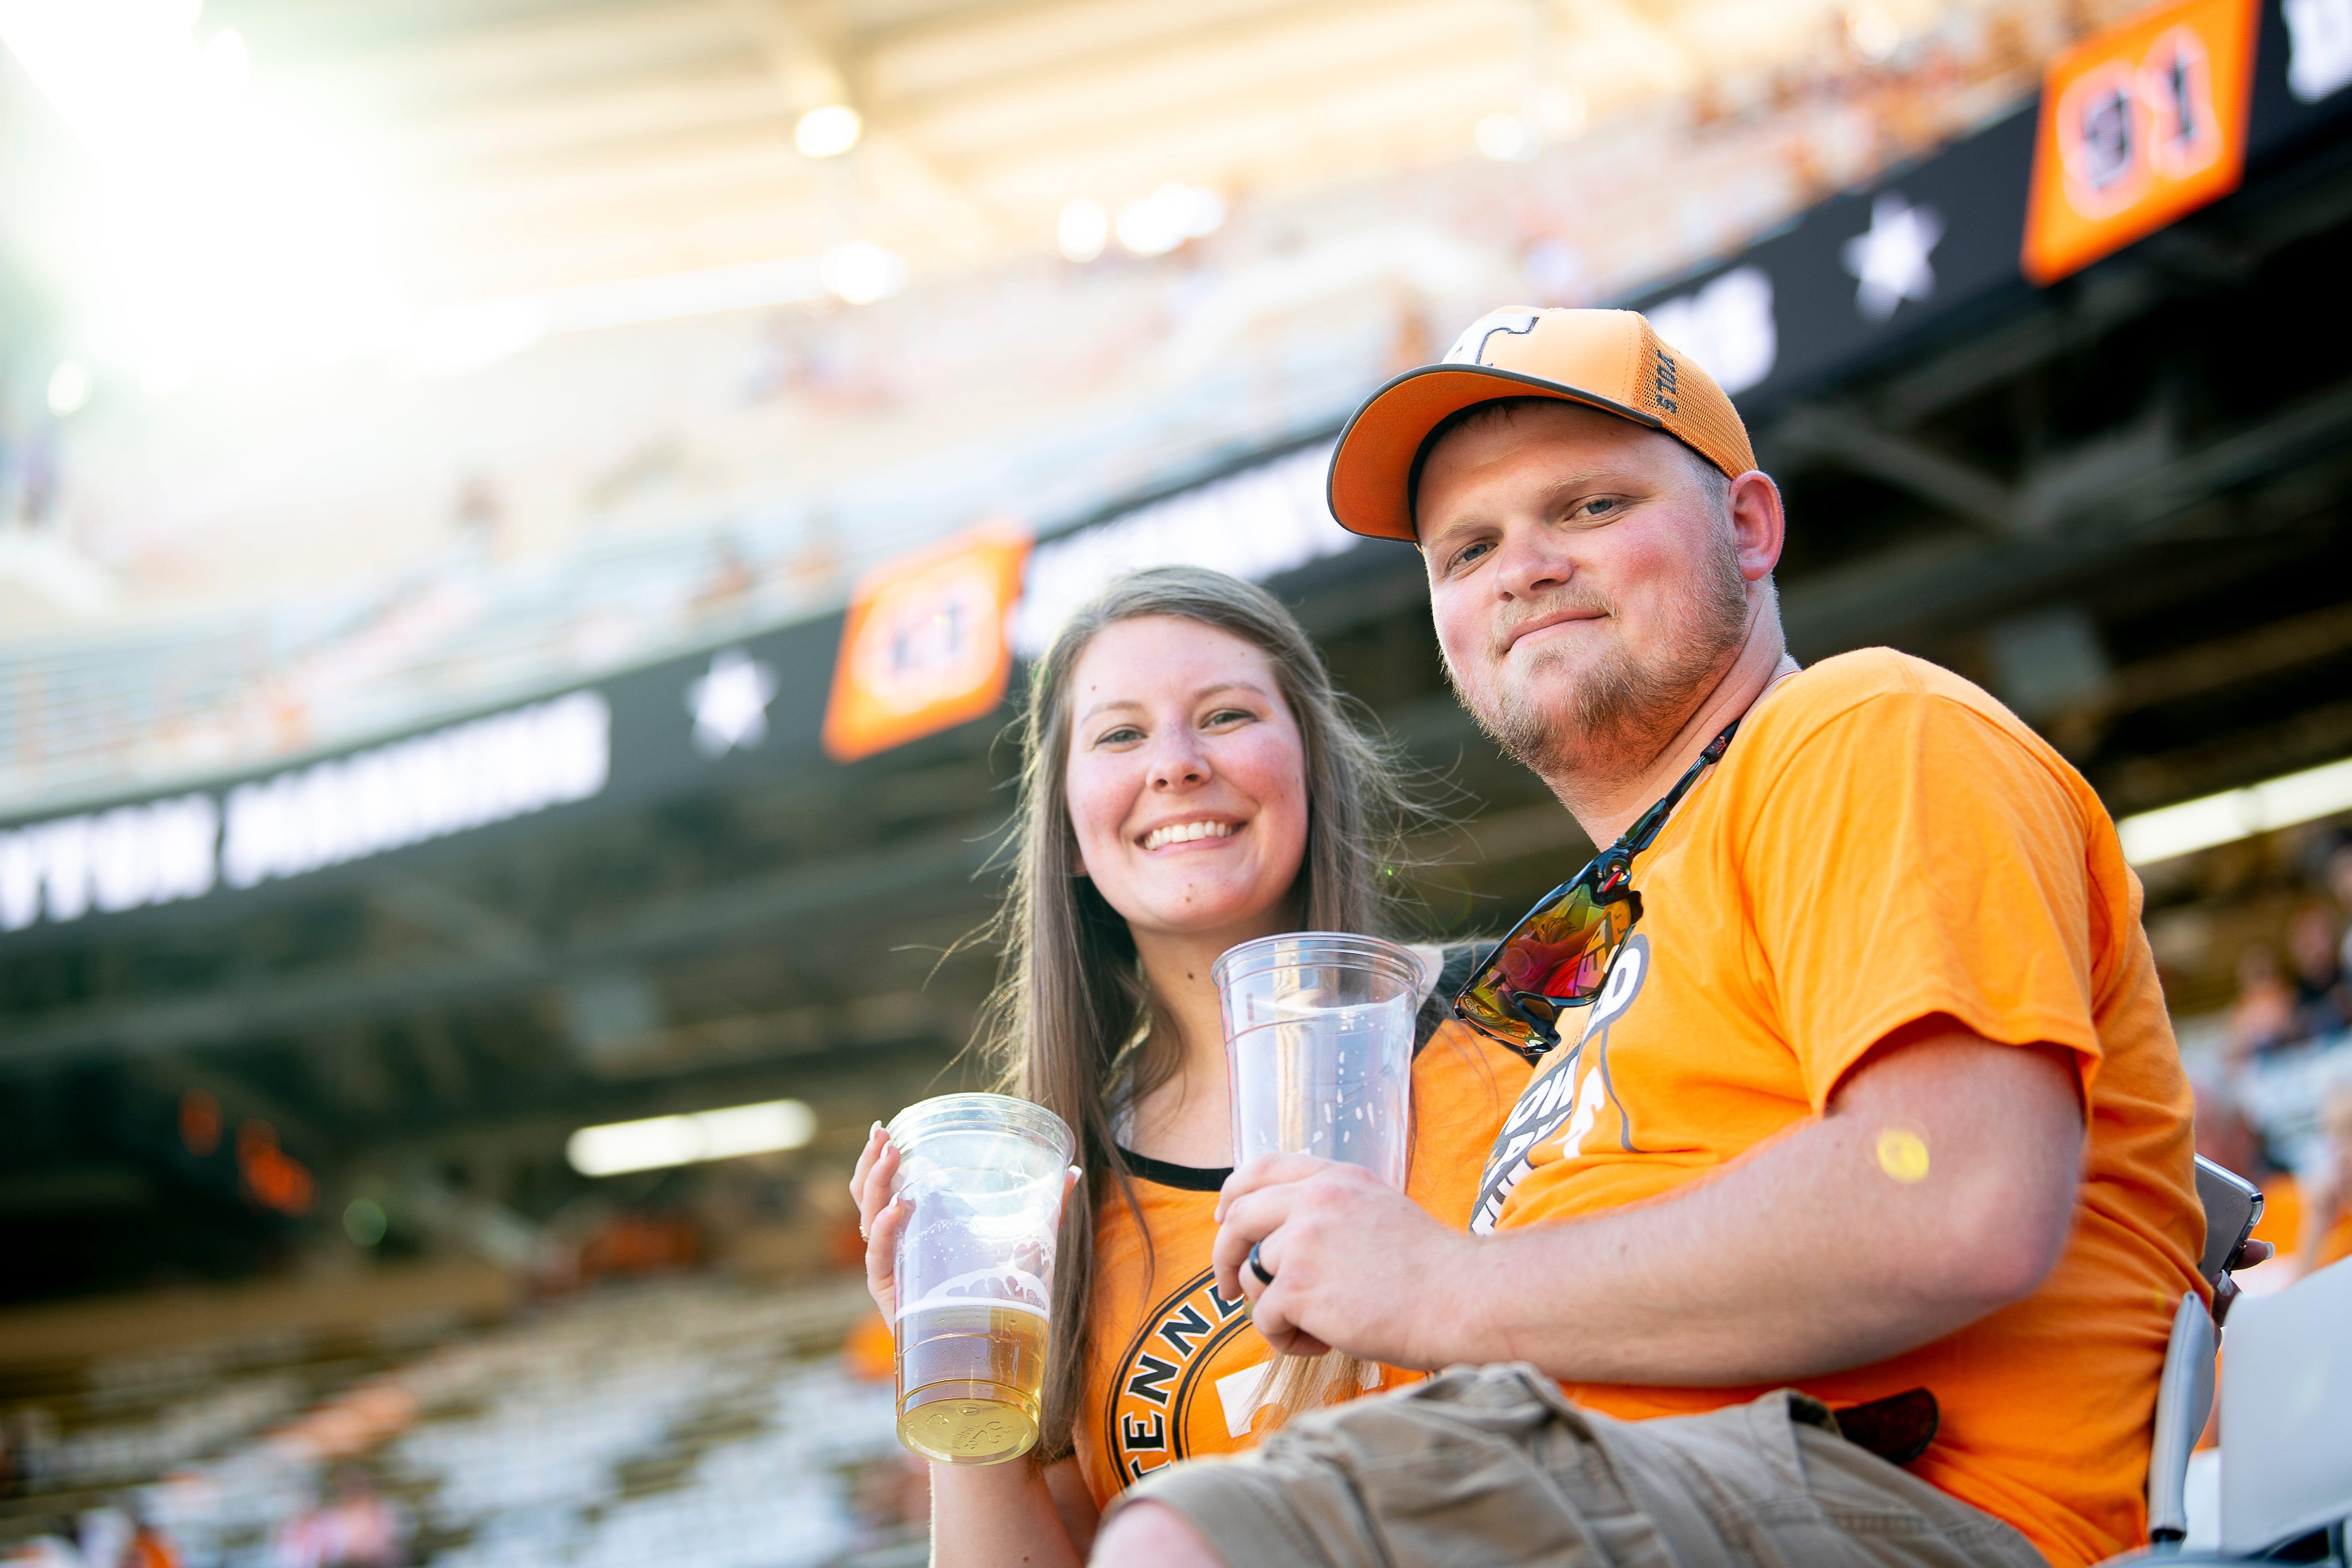 Honeymoon couple buys (perhaps) the first beers at Neyland Stadium